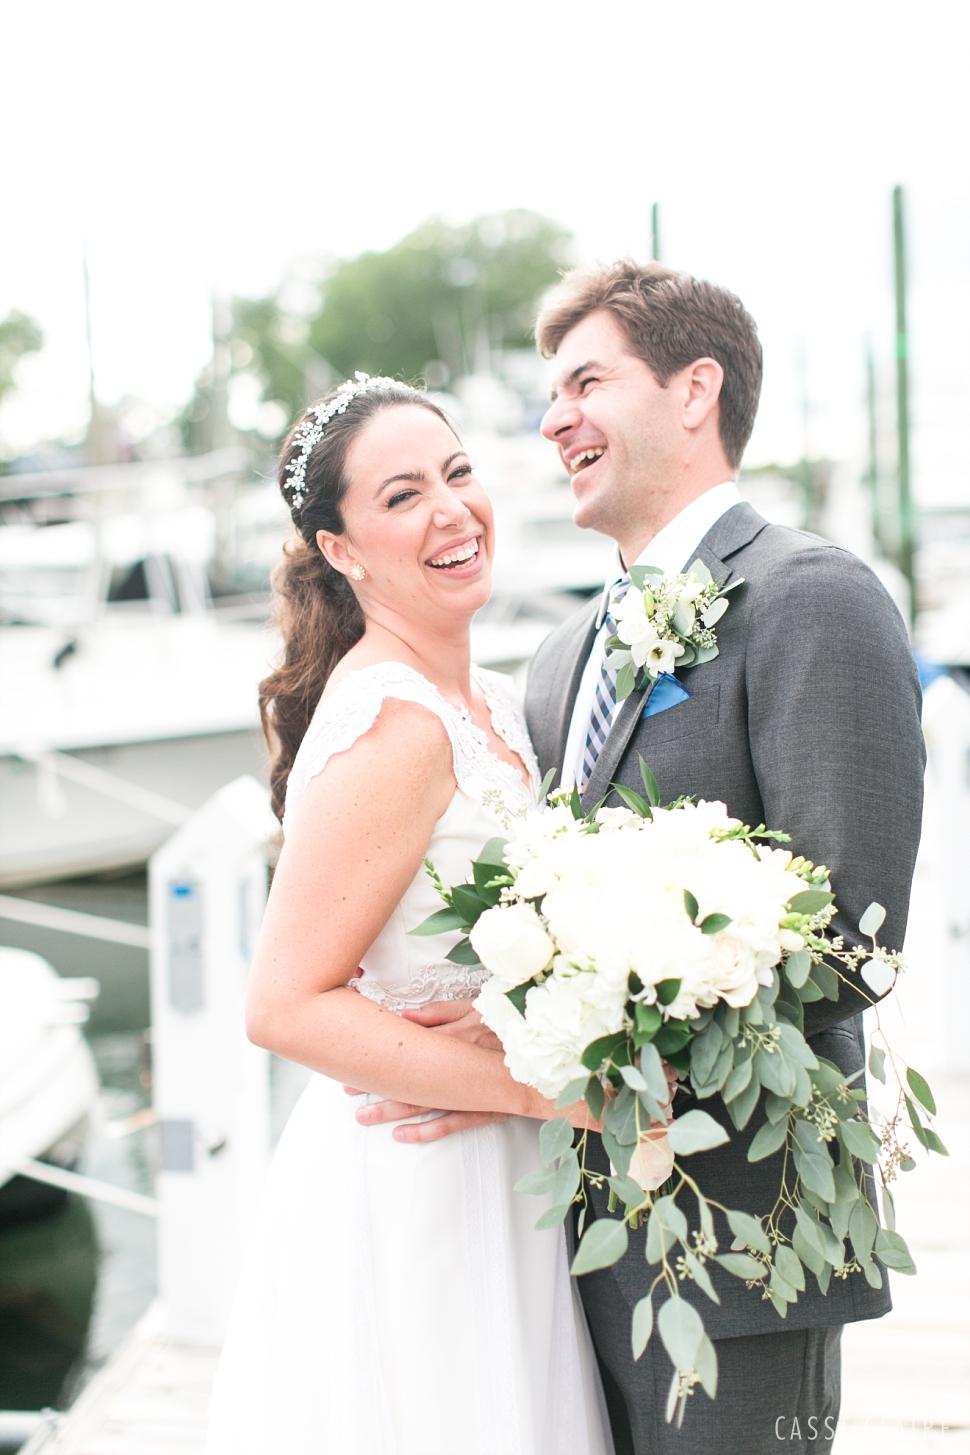 Bright-Happy-NJ-Wedding-Photographer-CassiClaire_68.jpg